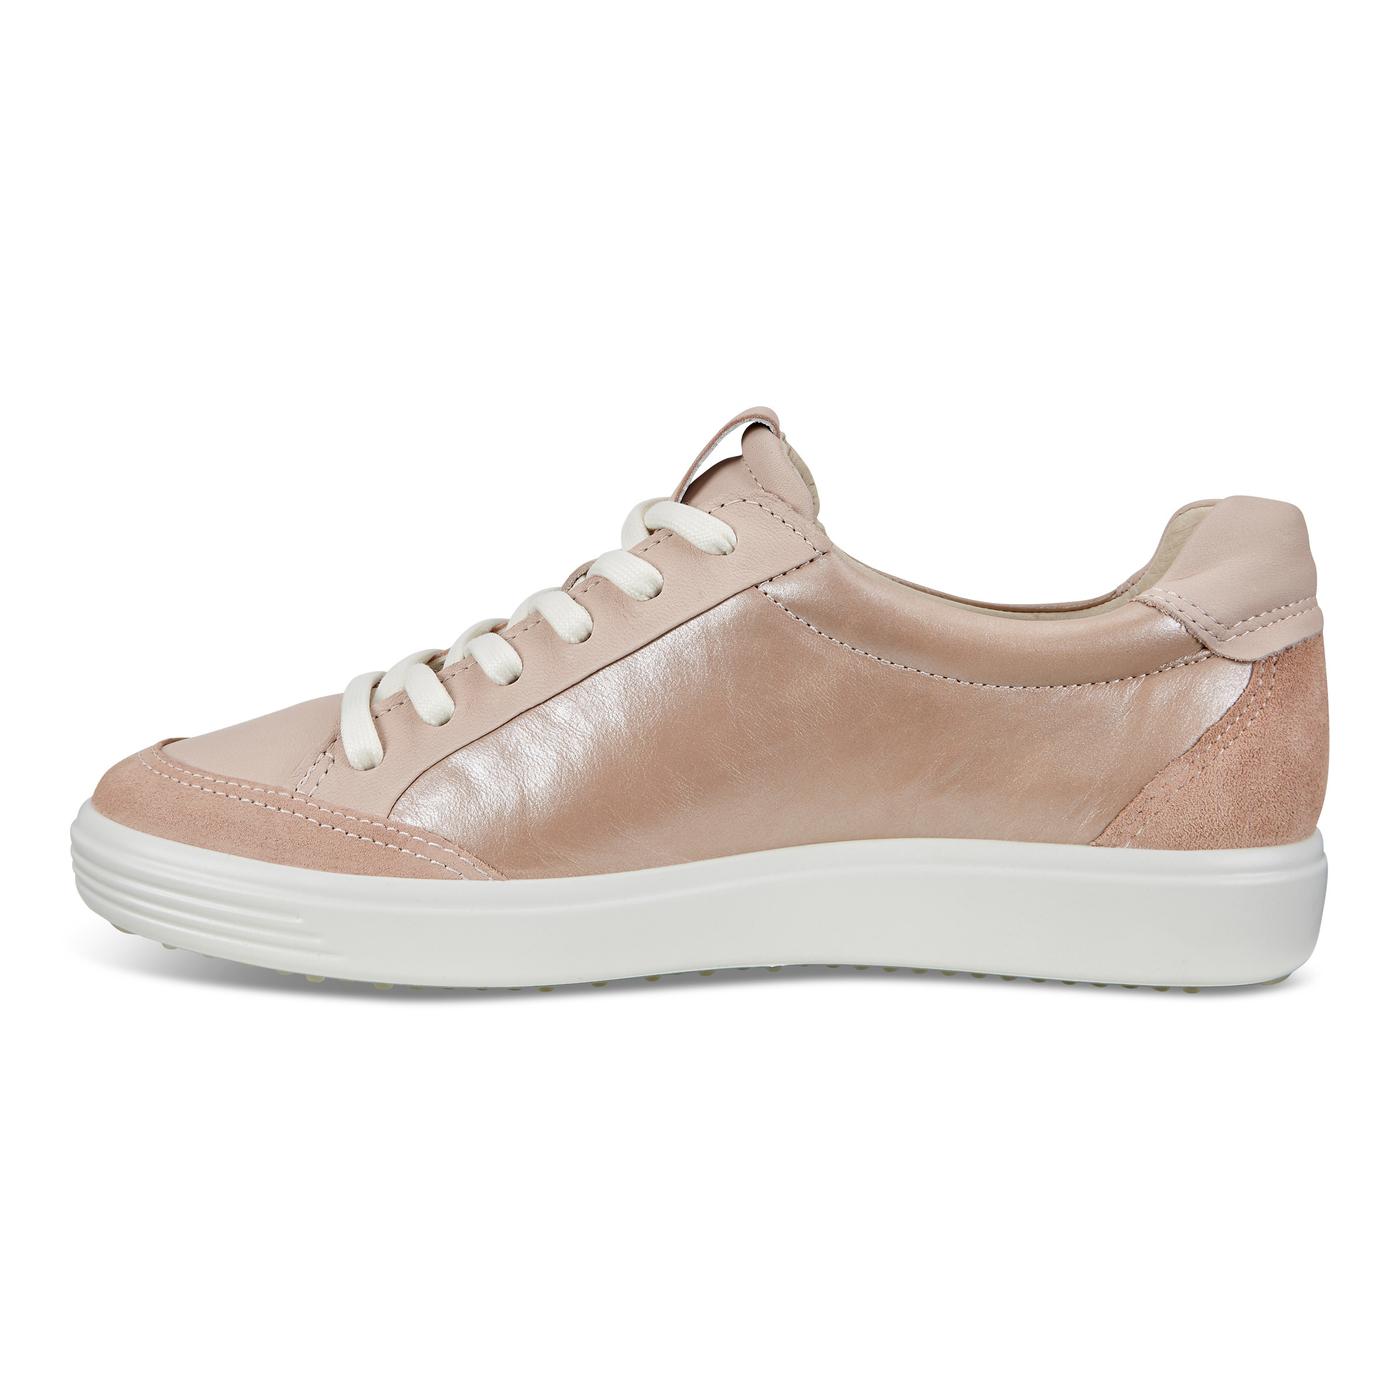 ECCO SOFT 7 LADIES Shoe